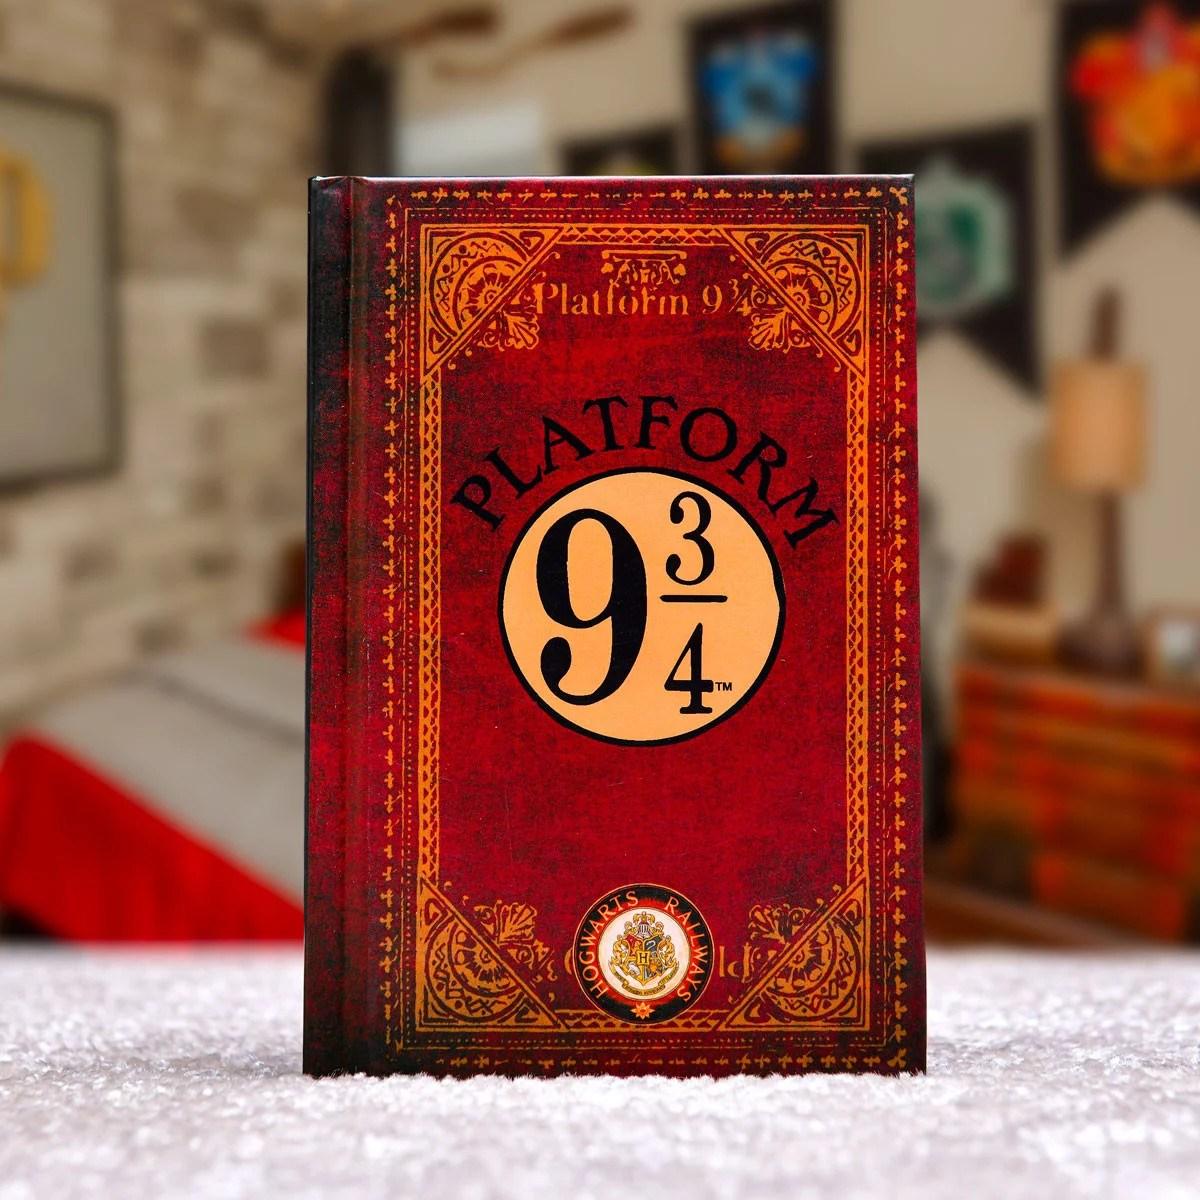 Truhla pro fanynku Harryho Pottera II.